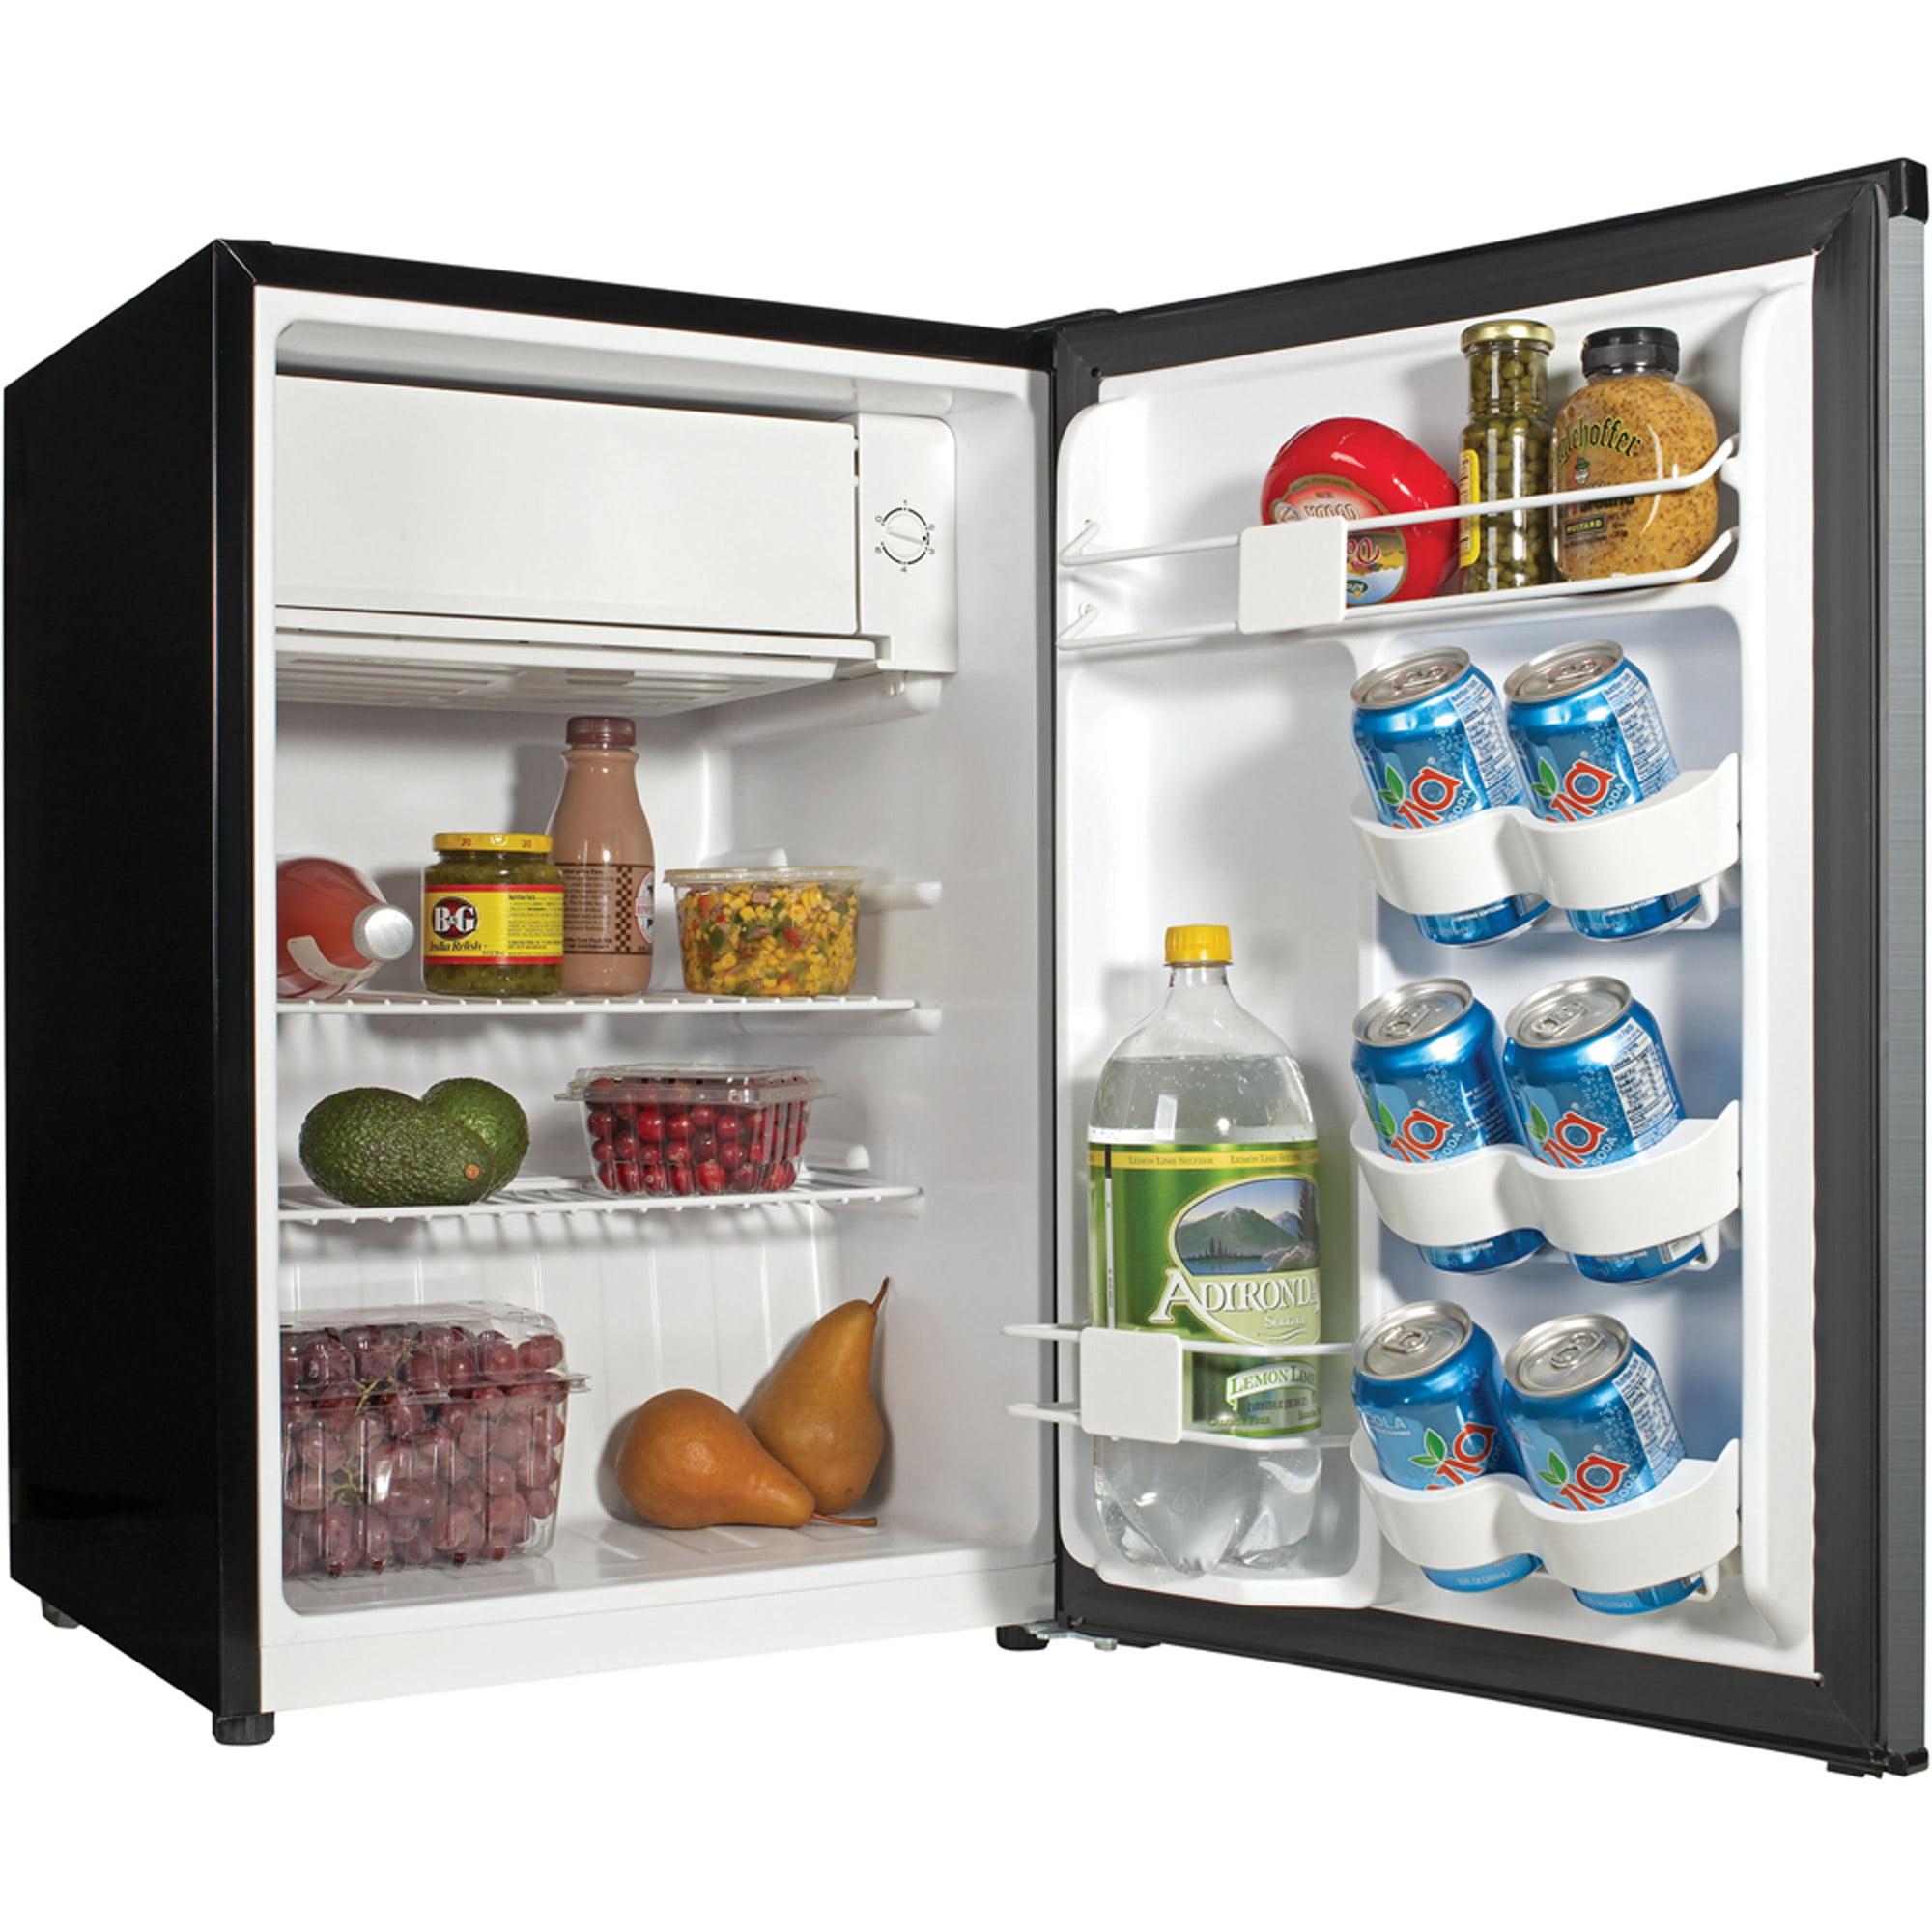 Mini Fridge Compact Steel Refrigerator 2 7 Cu Ft Dorm